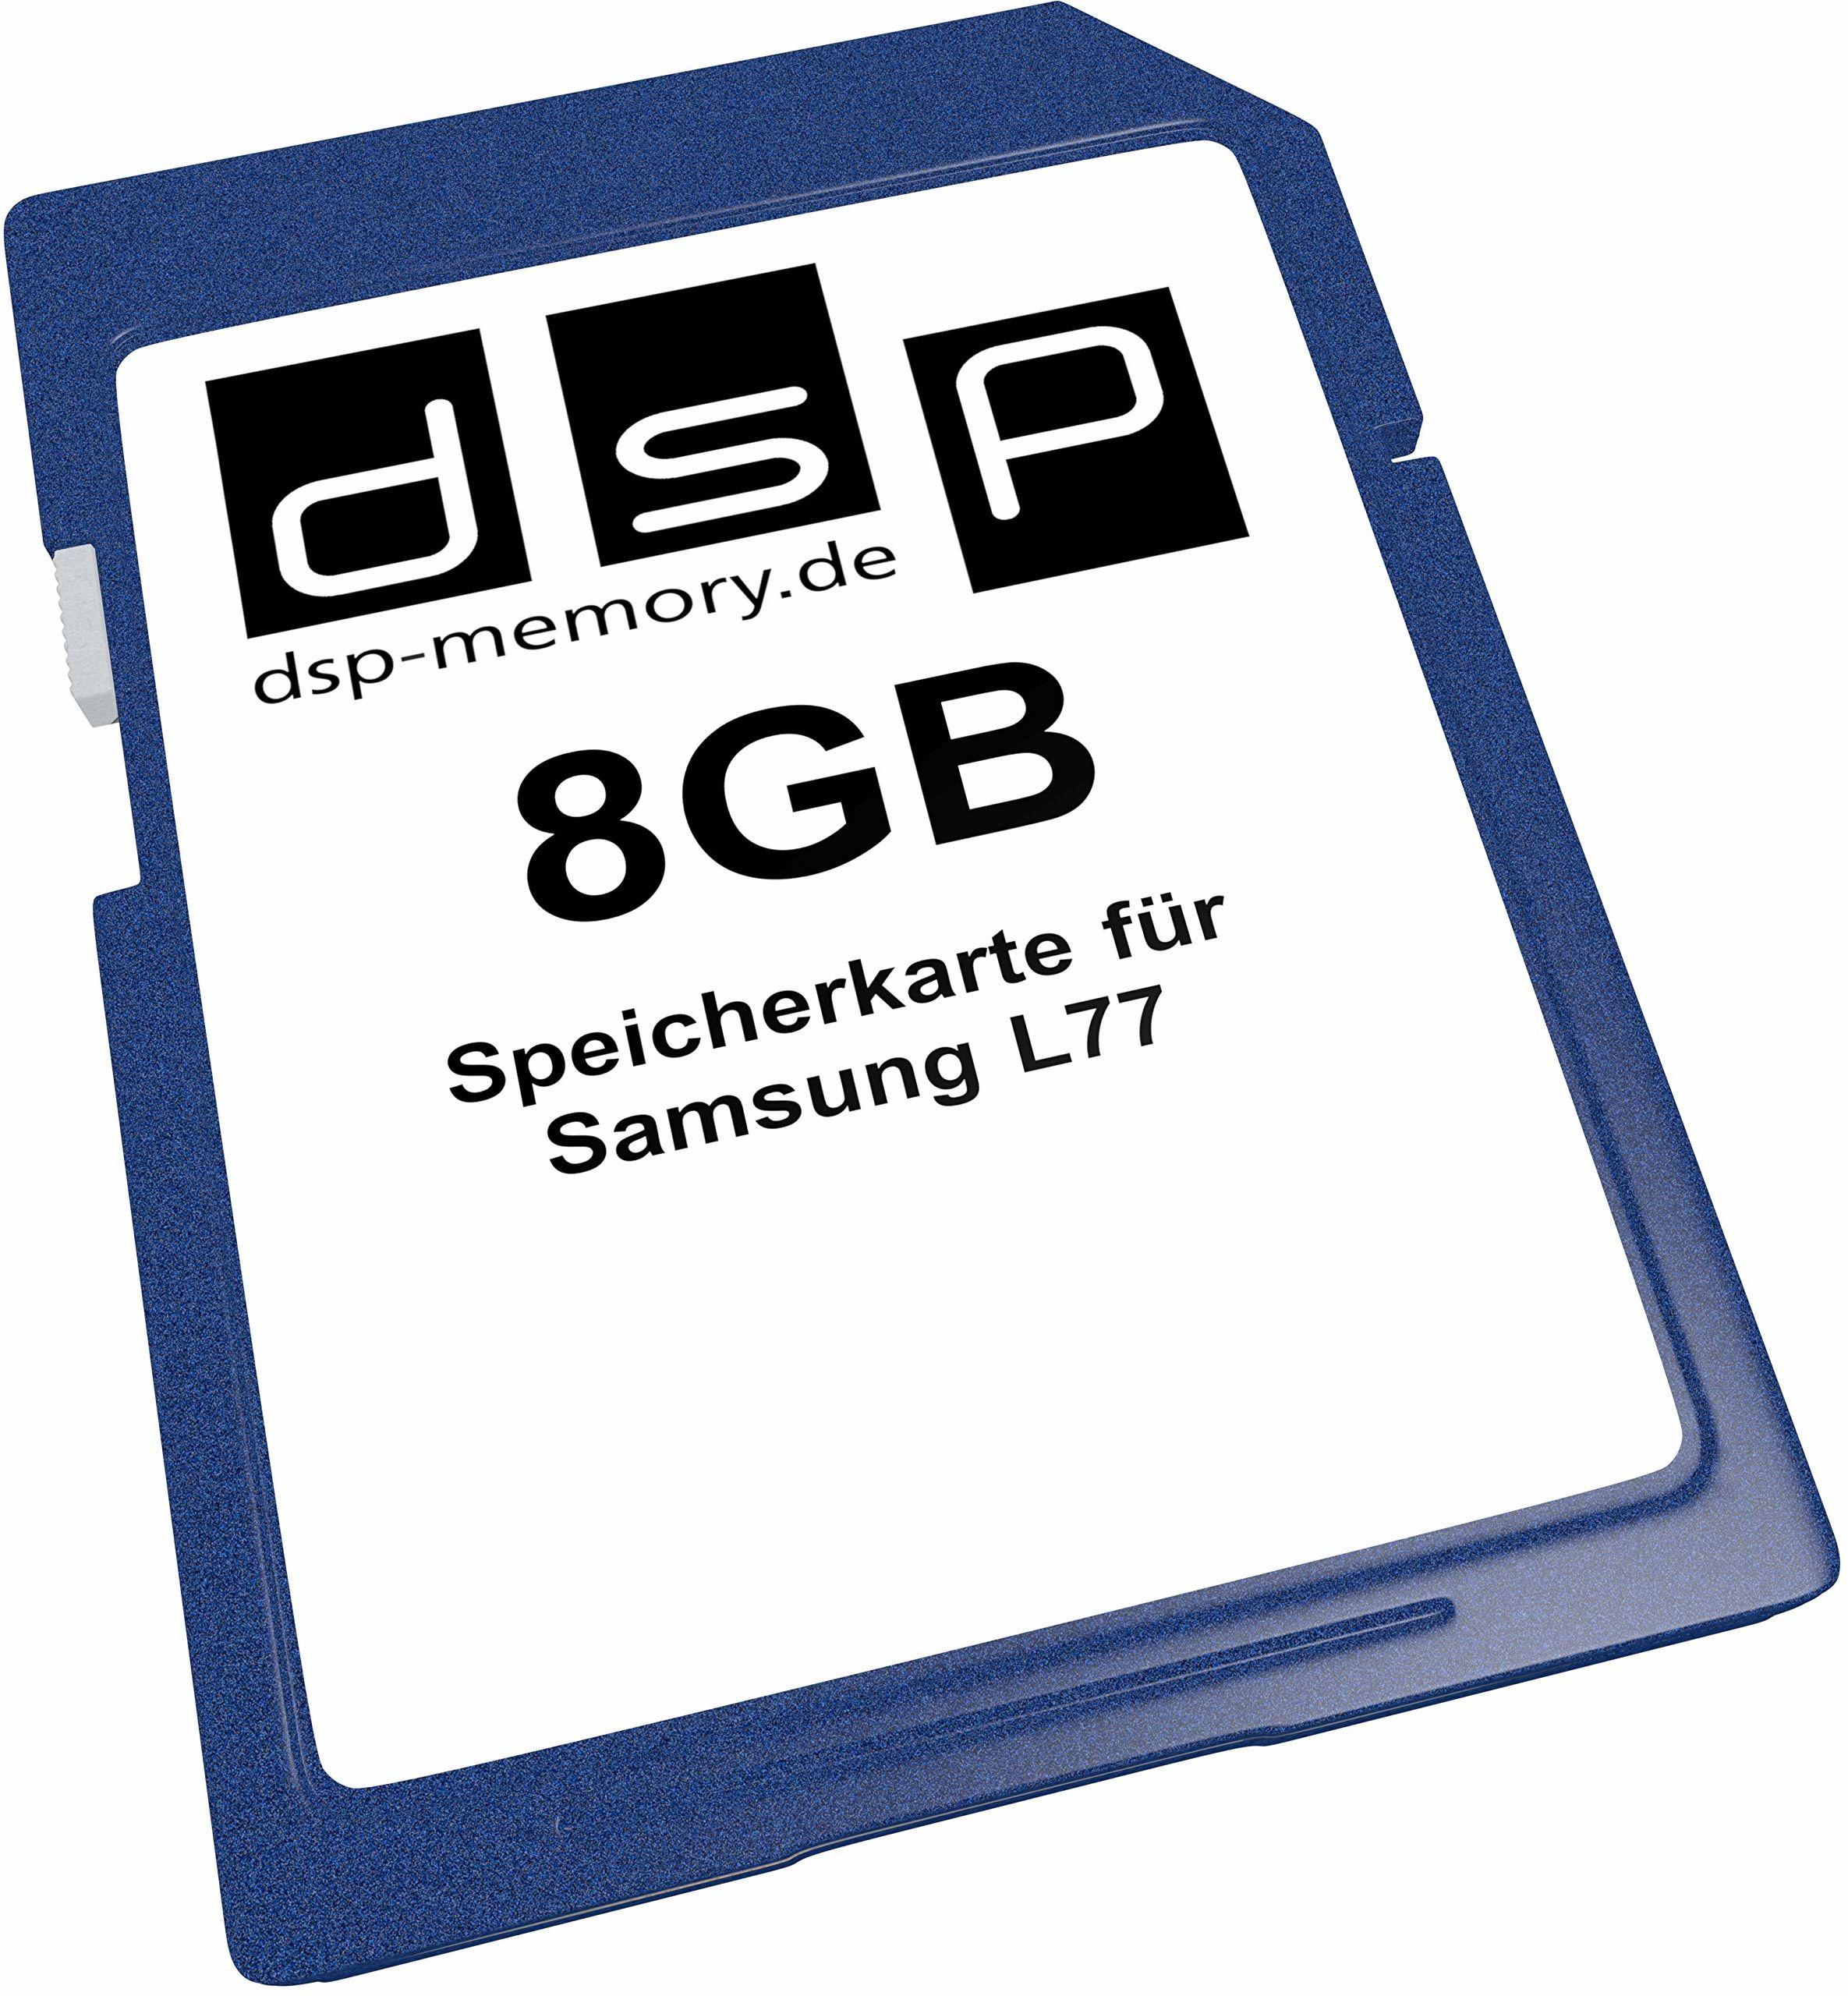 Karta pamięci 8 GB do Samsung L77